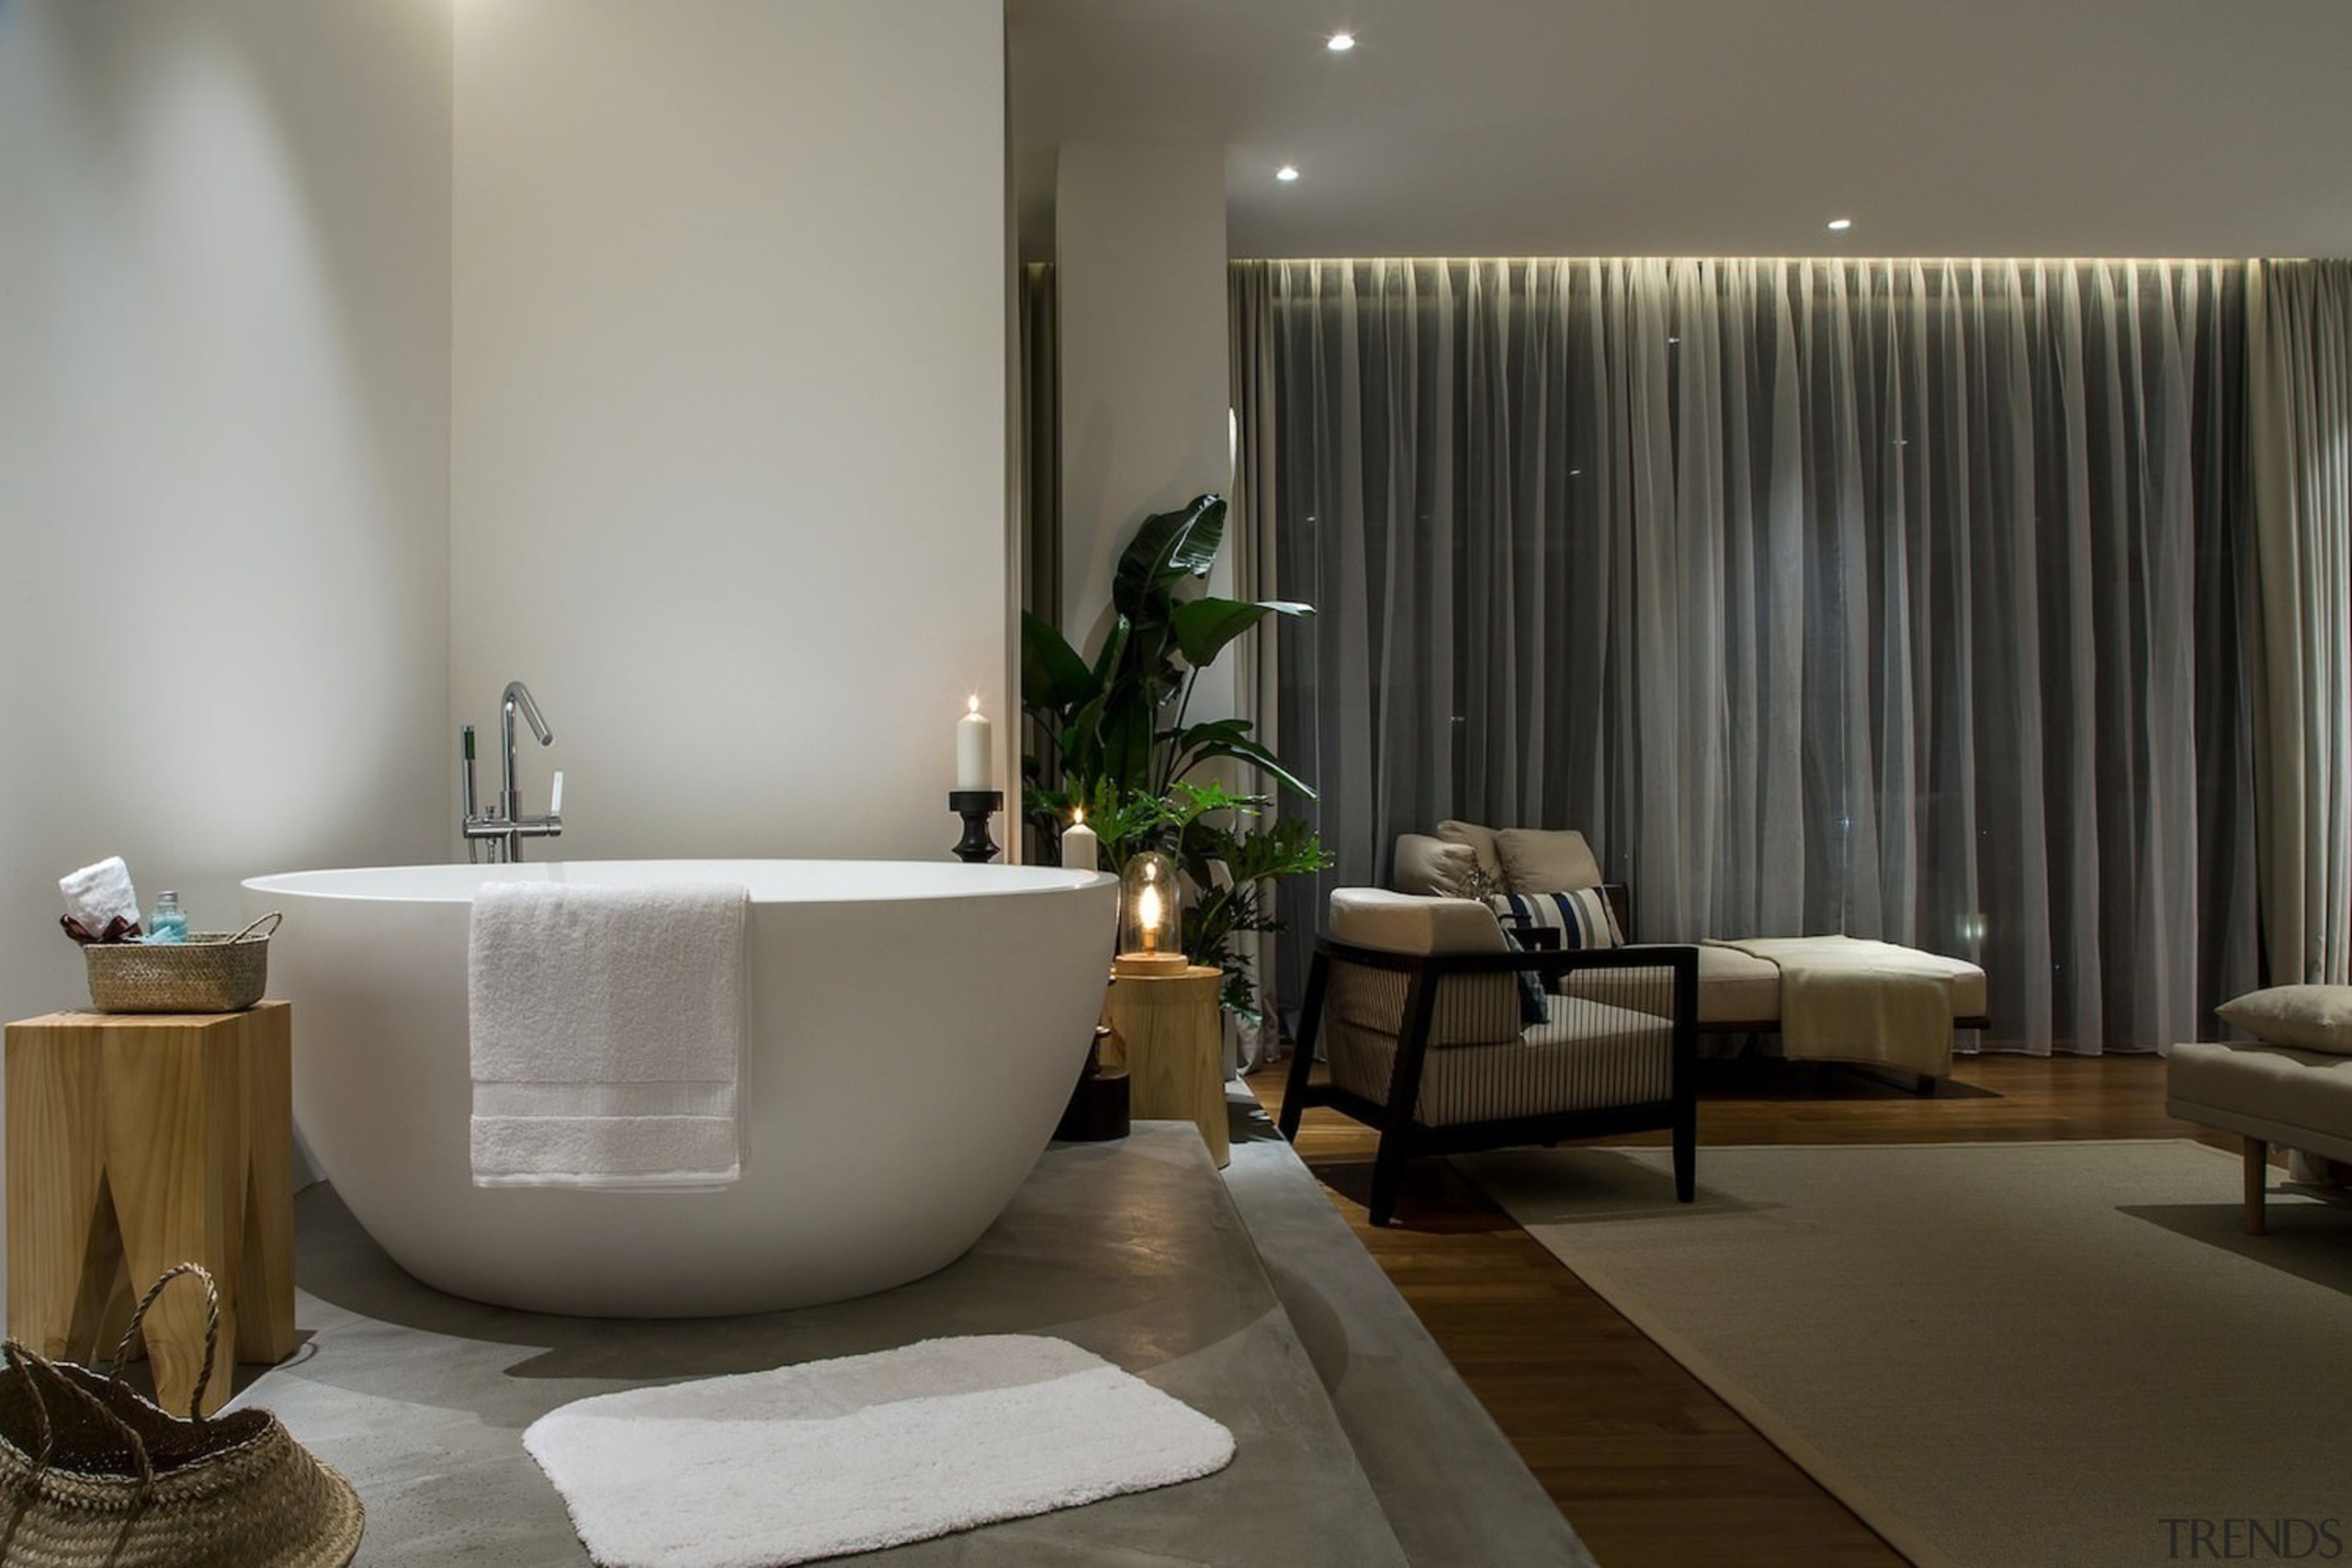 Fancy a relaxing soak in the tub before bathroom, interior design, plumbing fixture, room, gray